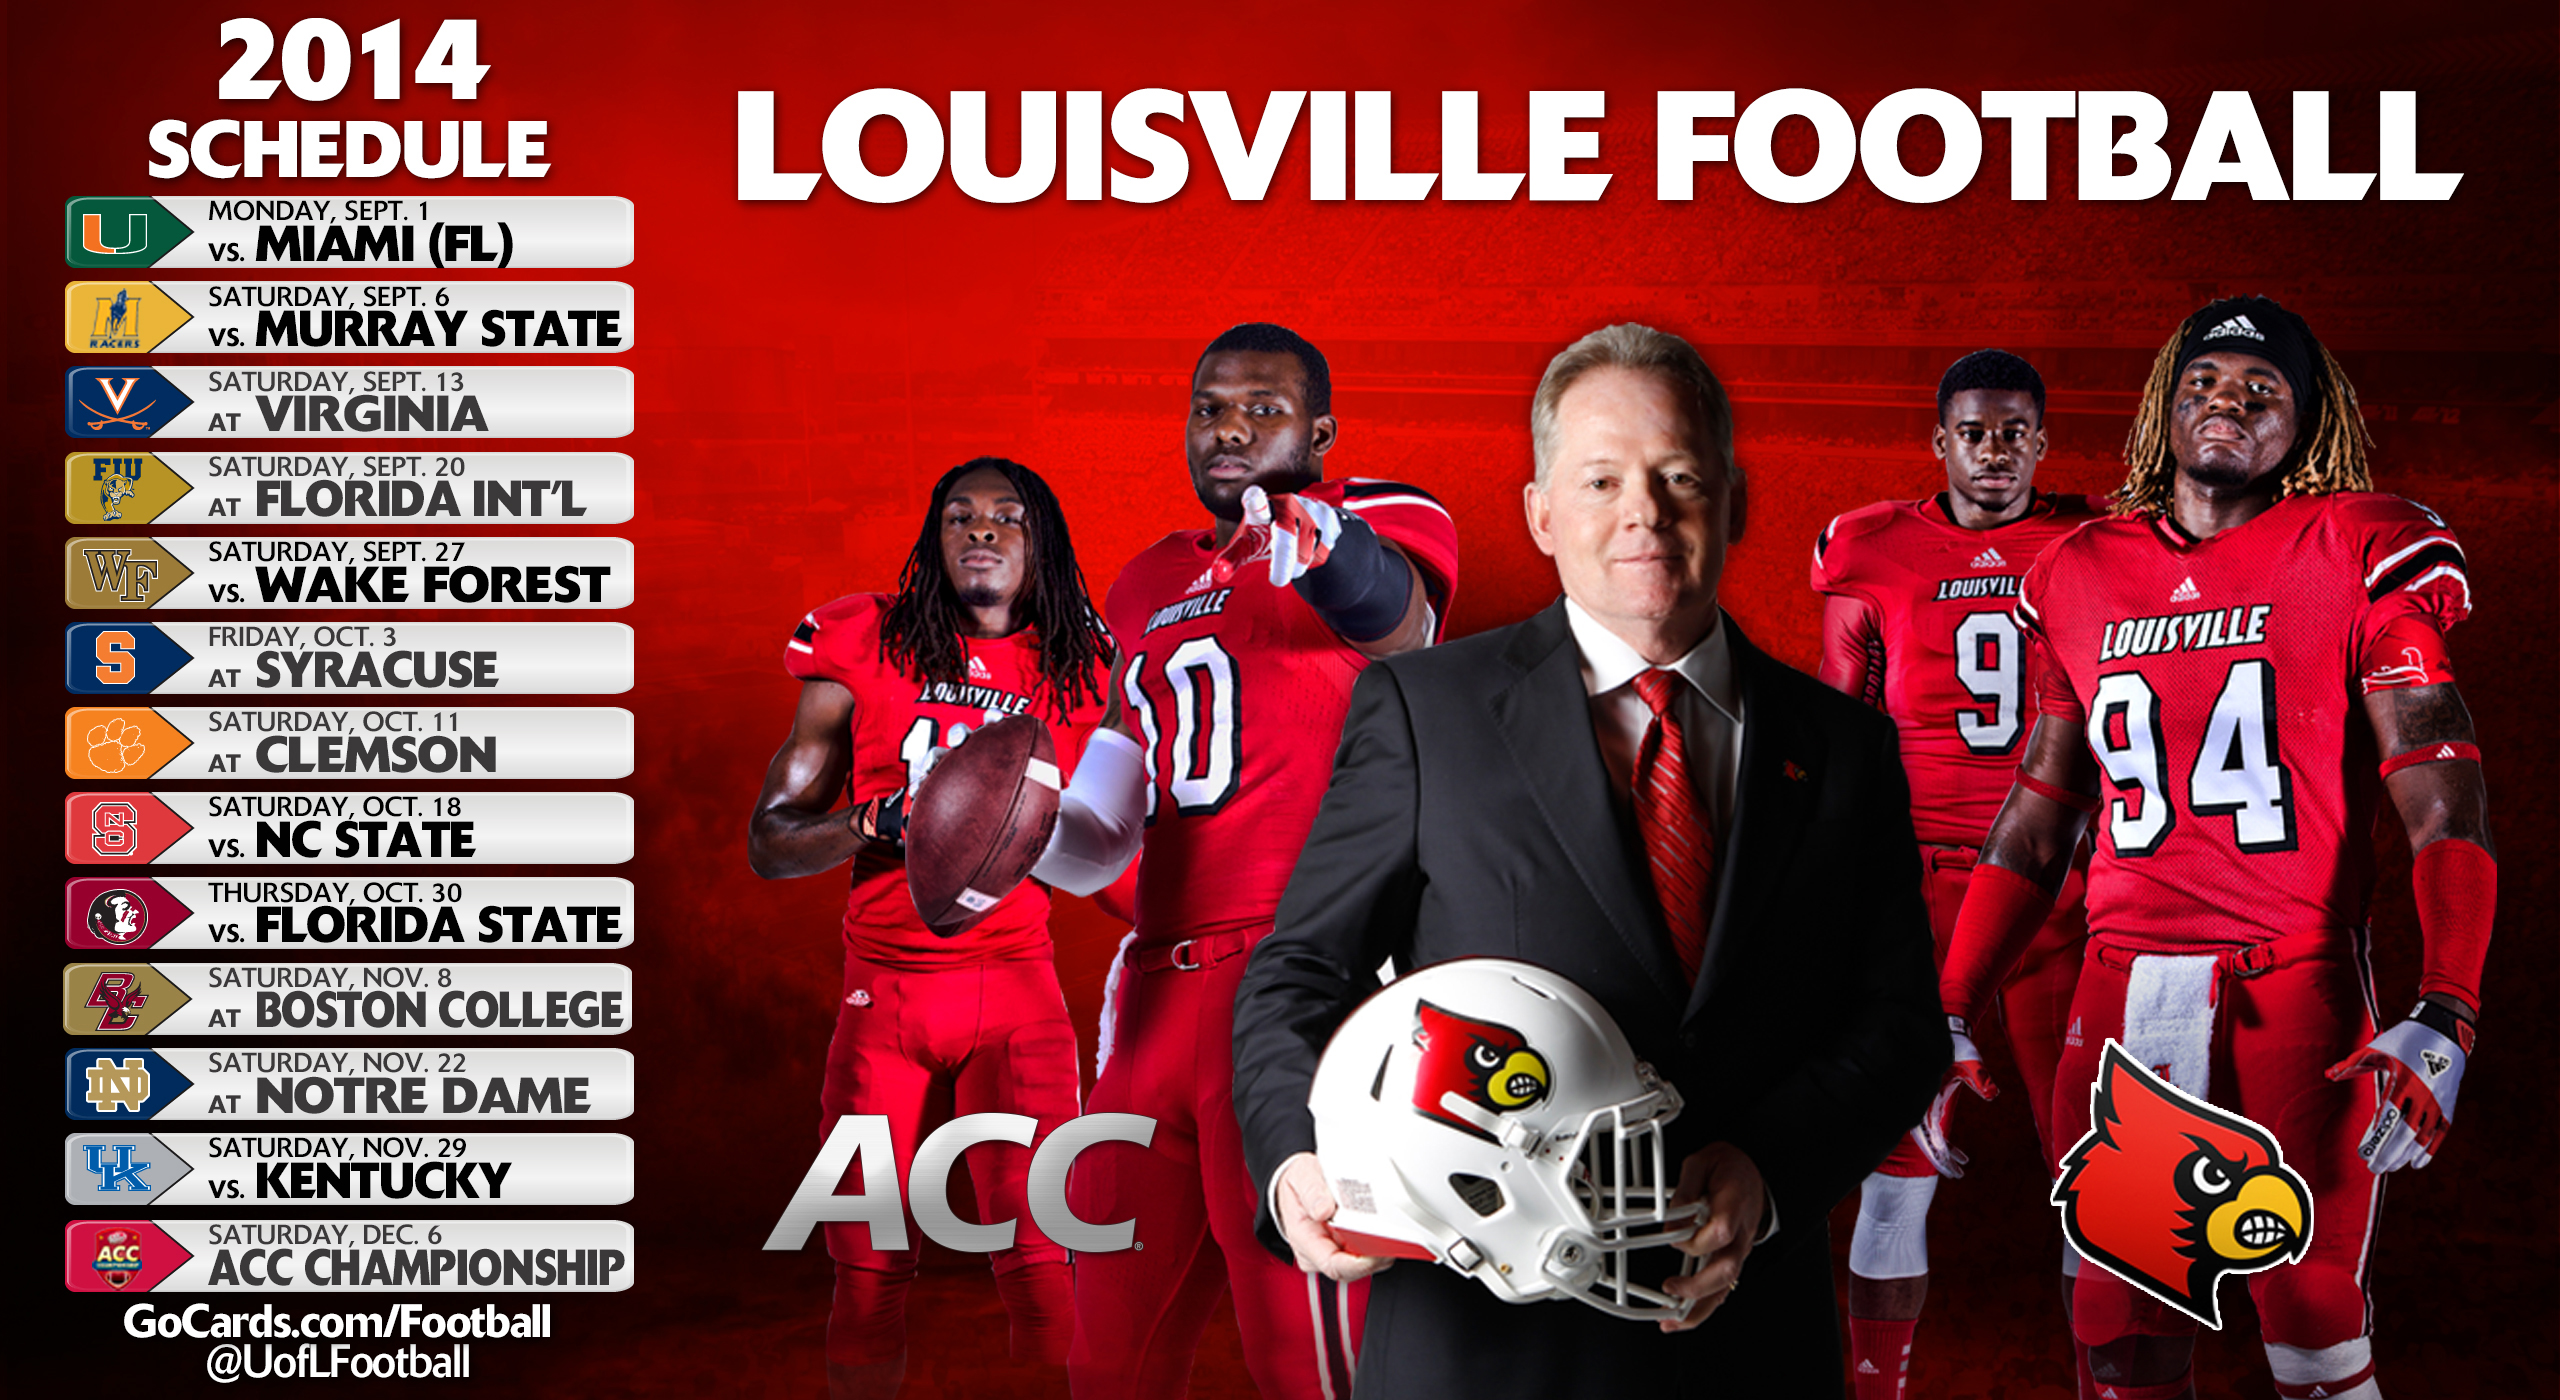 University Of Louisville Football Wallpaper - WallpaperSafari